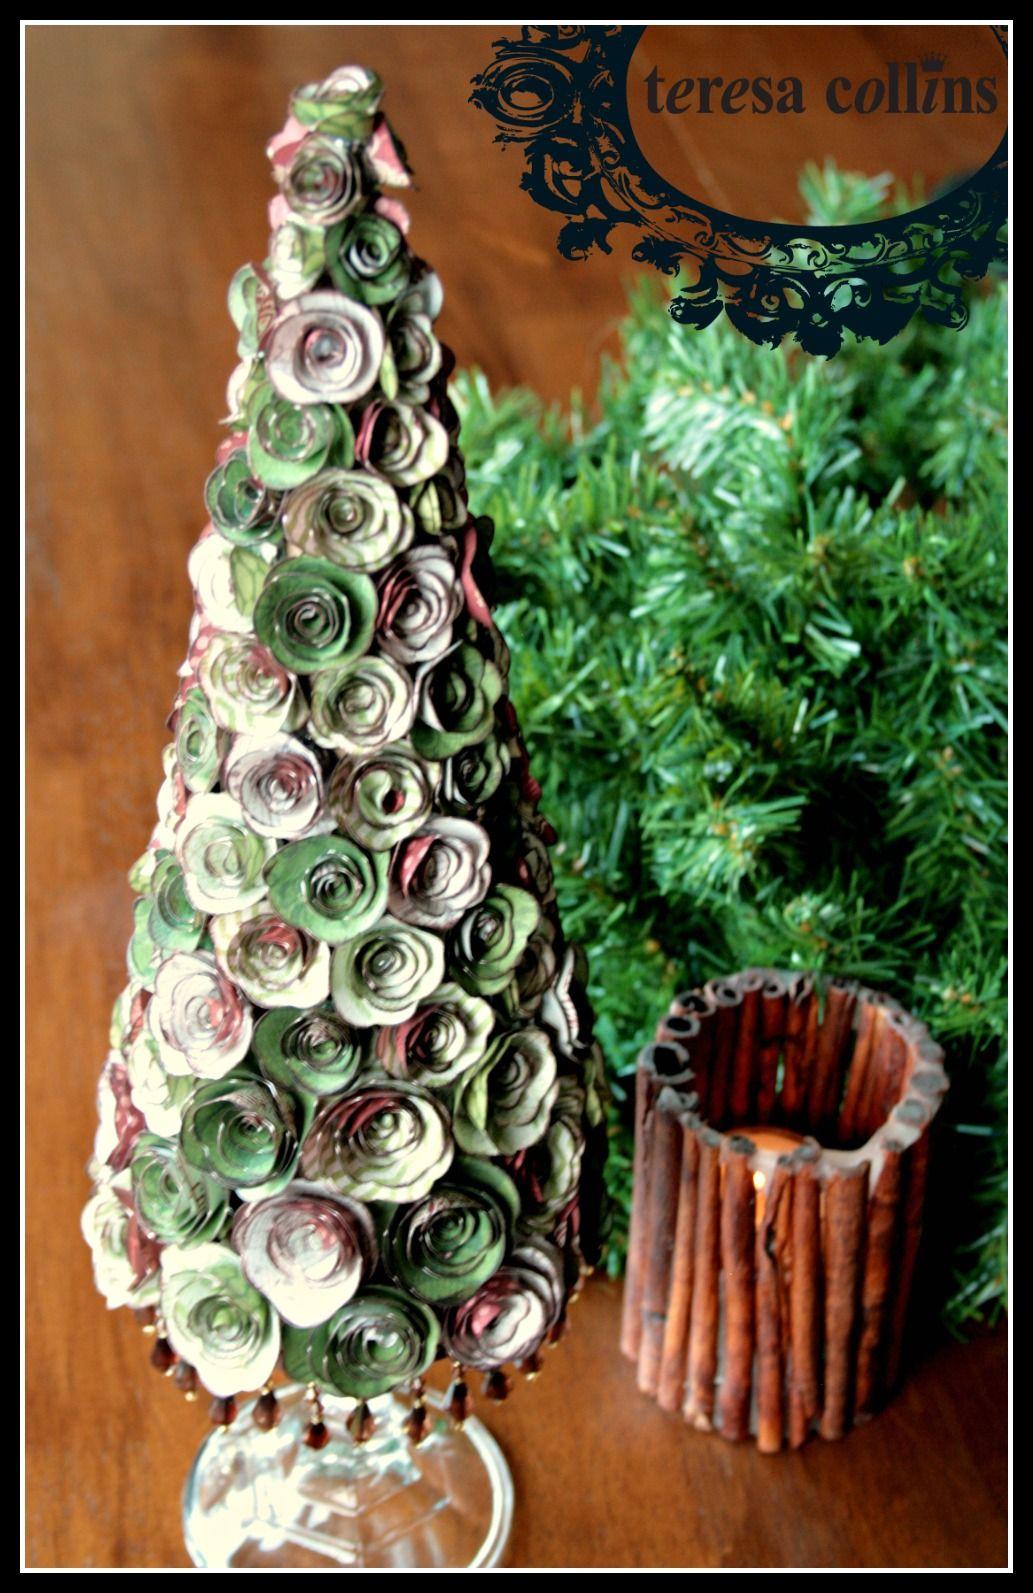 Teresa collins design team oh christmas tree tutorial by cheri